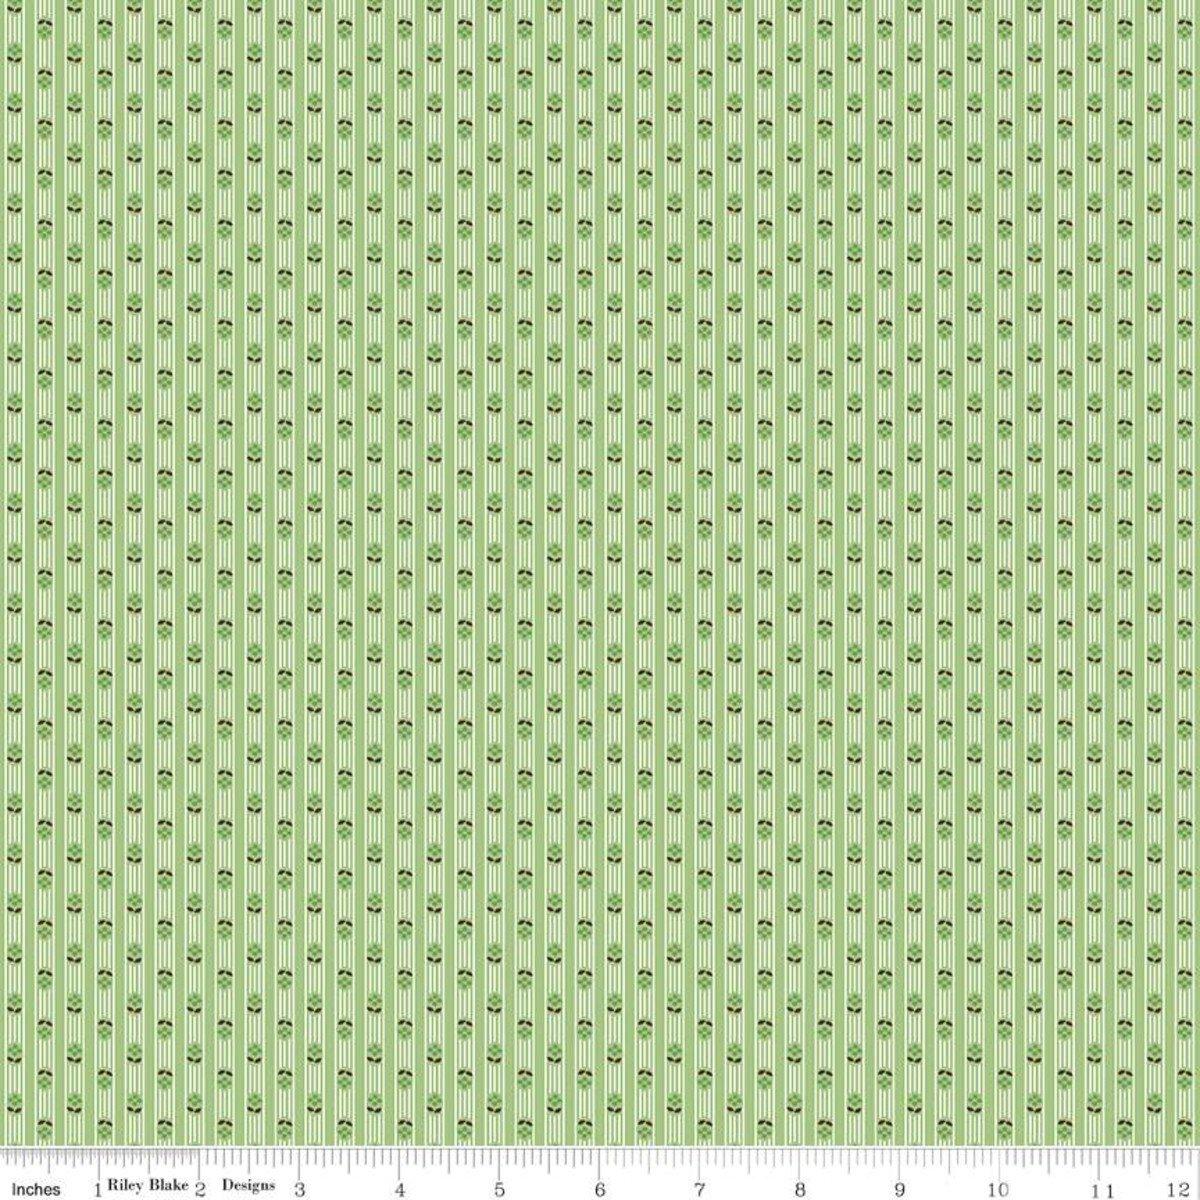 Prim C9705 Stripe Granny Apple by Lori Holt for Riley Blake Designs